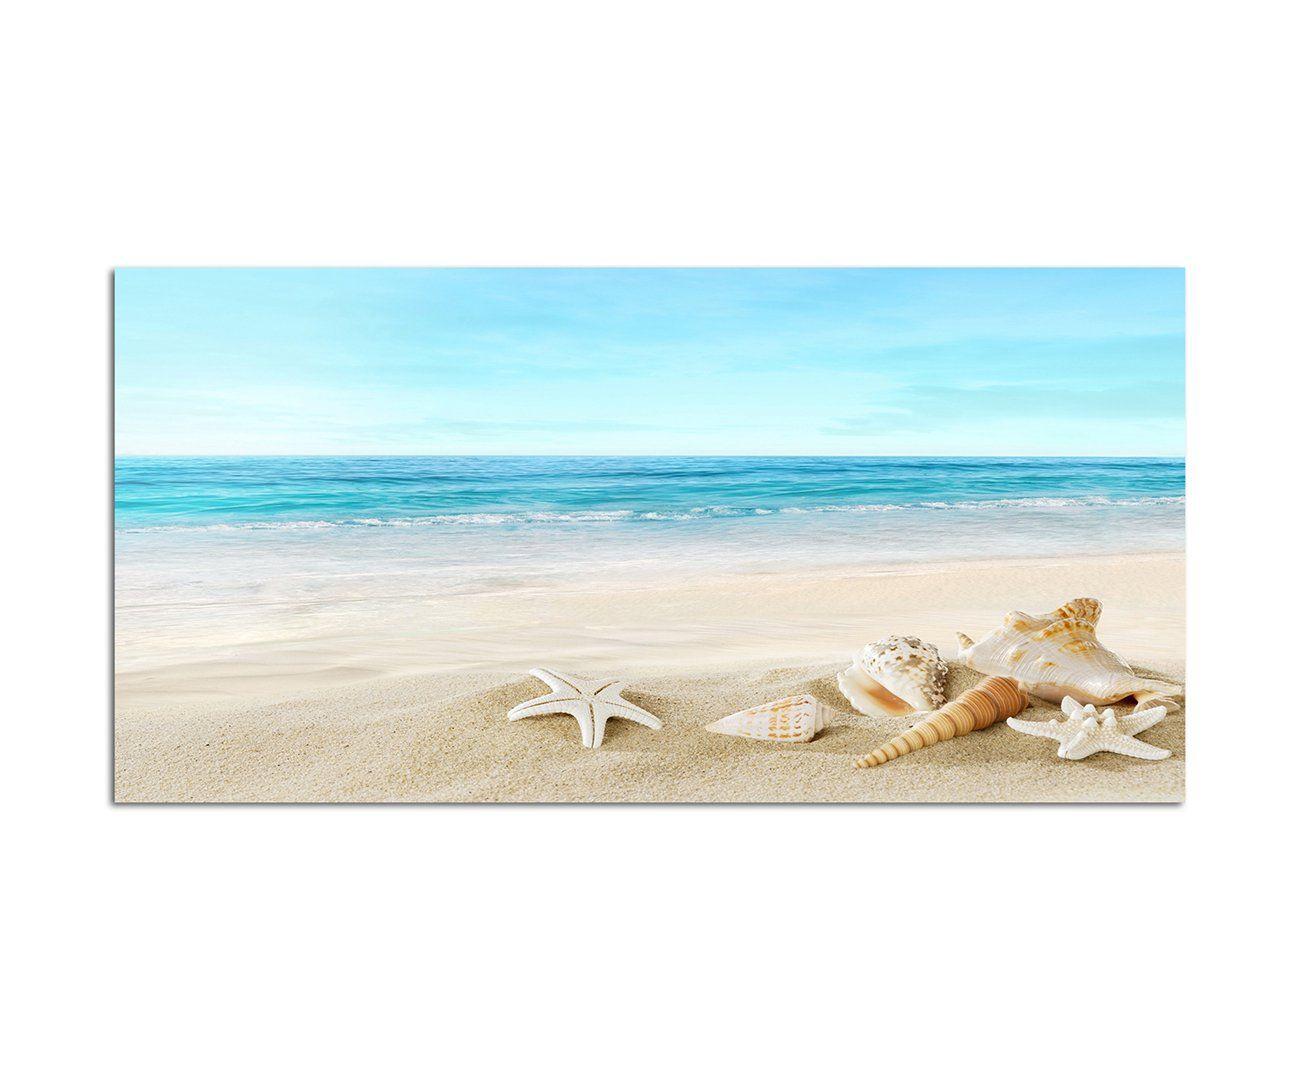 35€ Cuadro Panorama 120x60cm (Conchas en la Playa) Cuadro XXL Arte ...